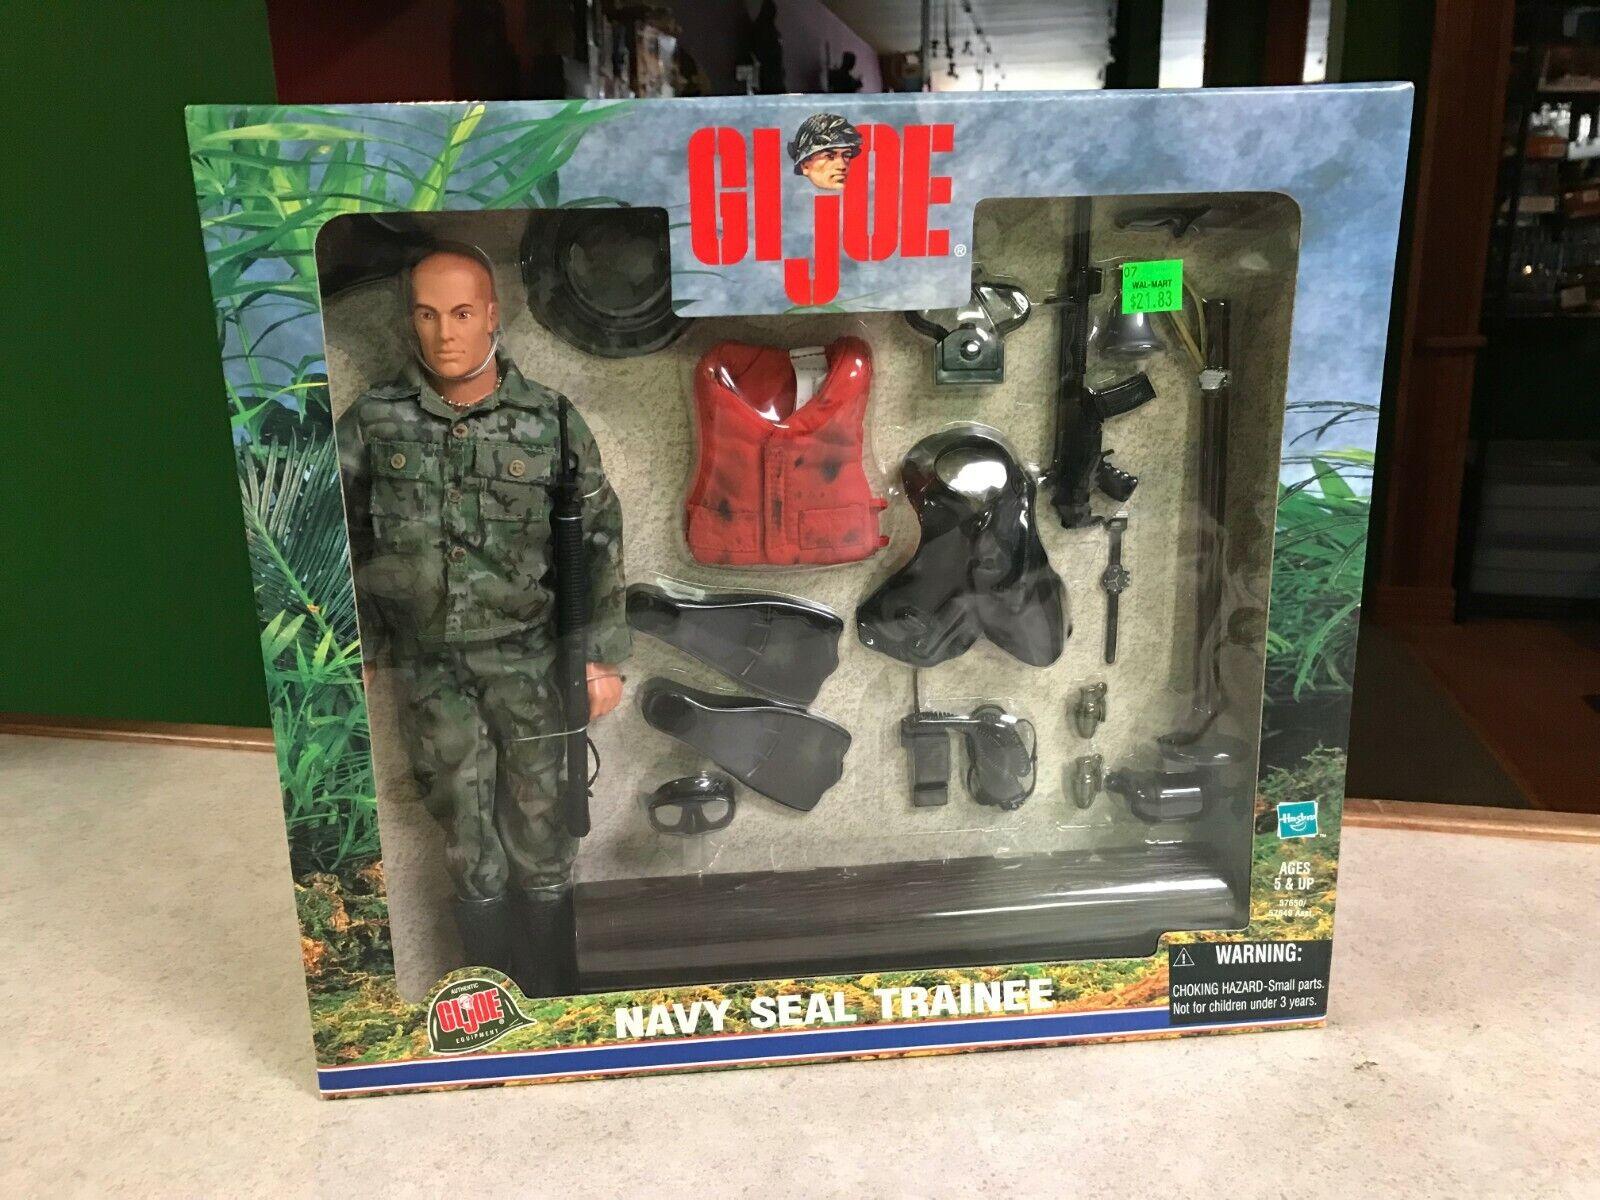 1999 Hasbro Gijoe Classic Navy Seal aprendiza figura de 12  Nuevo En Caja